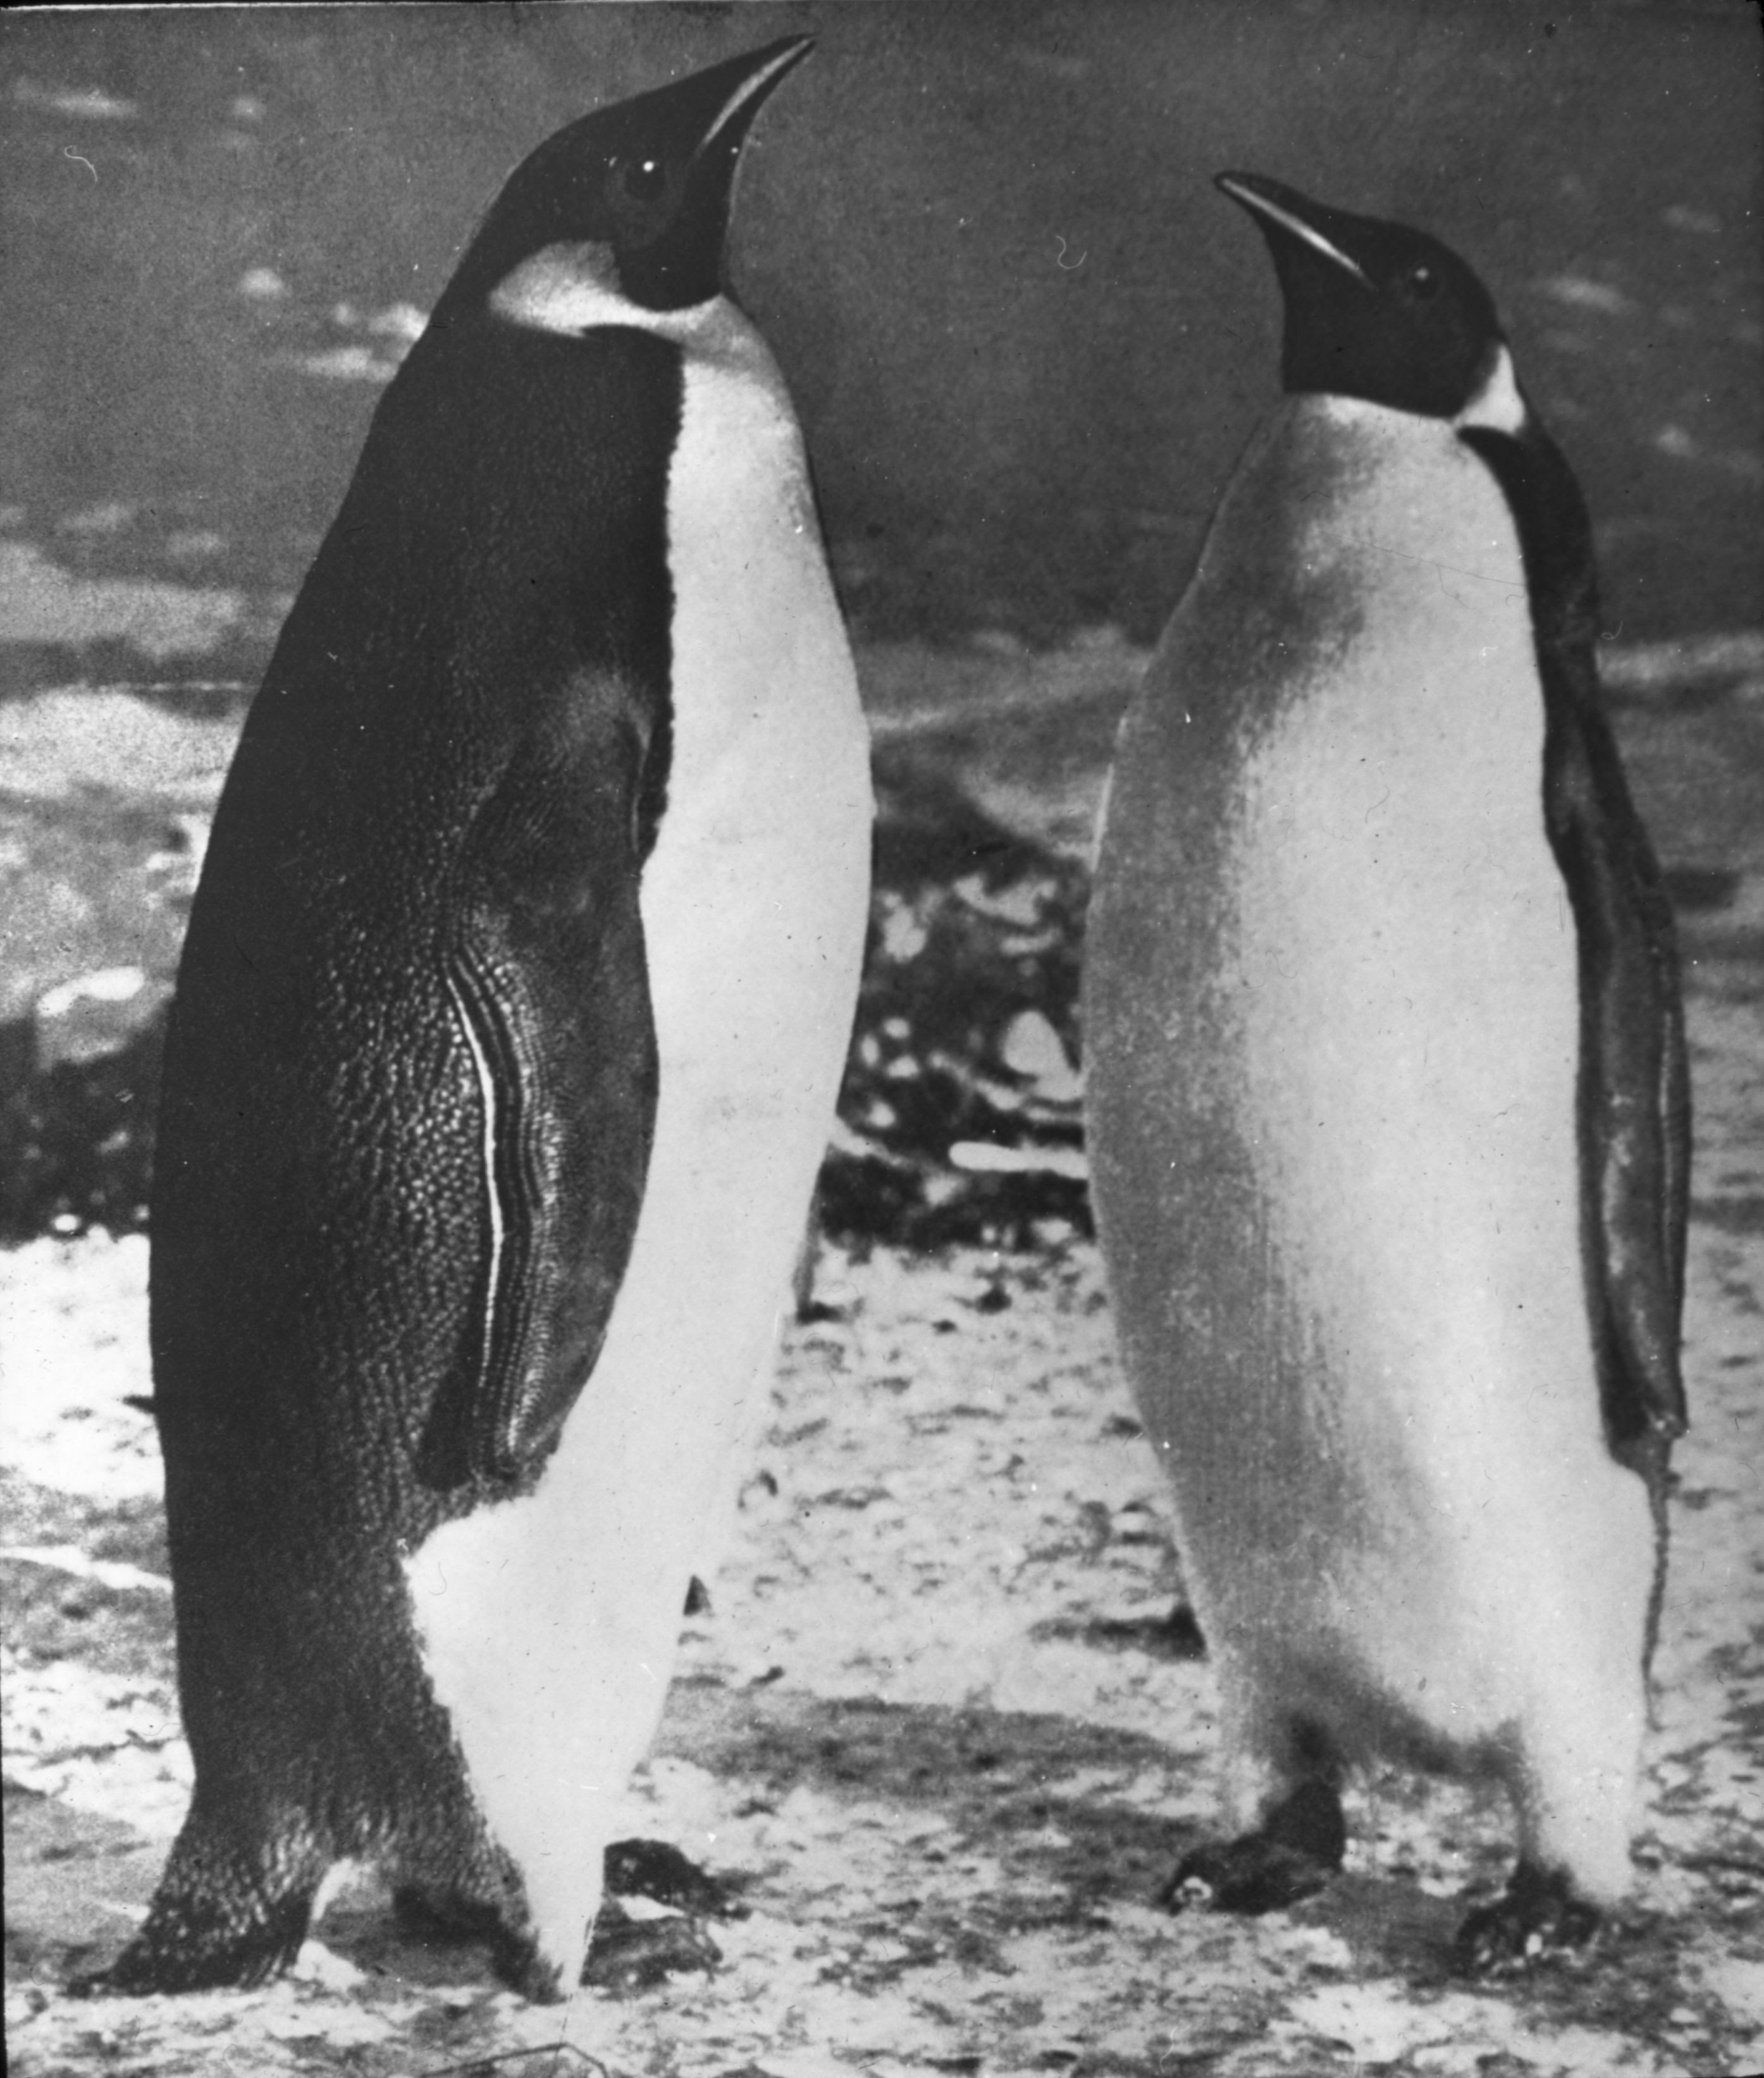 http://upload.wikimedia.org/wikipedia/commons/d/dd/Shackleton_nimrod_76.jpg